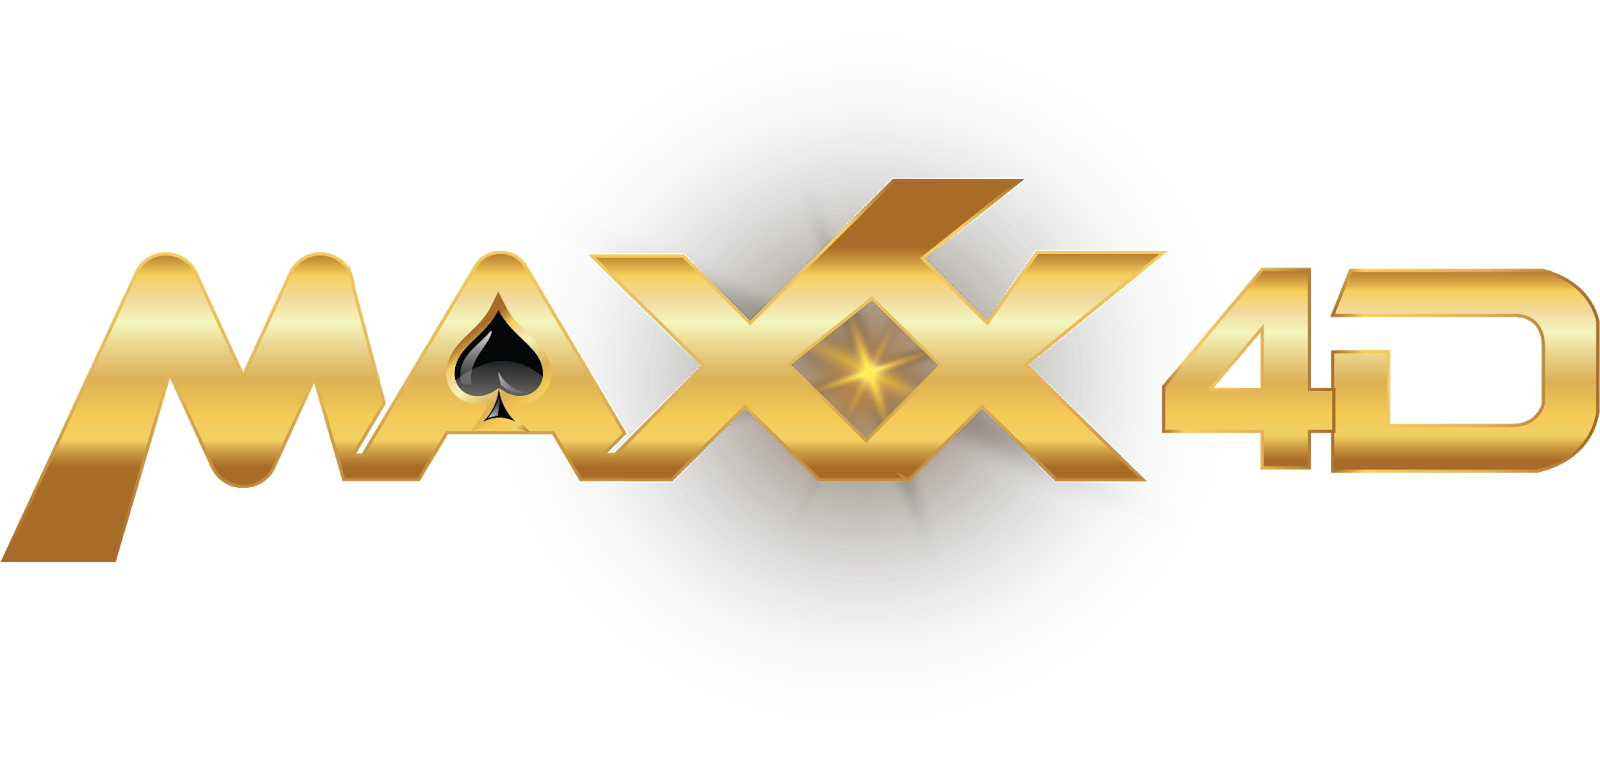 MAXX4D